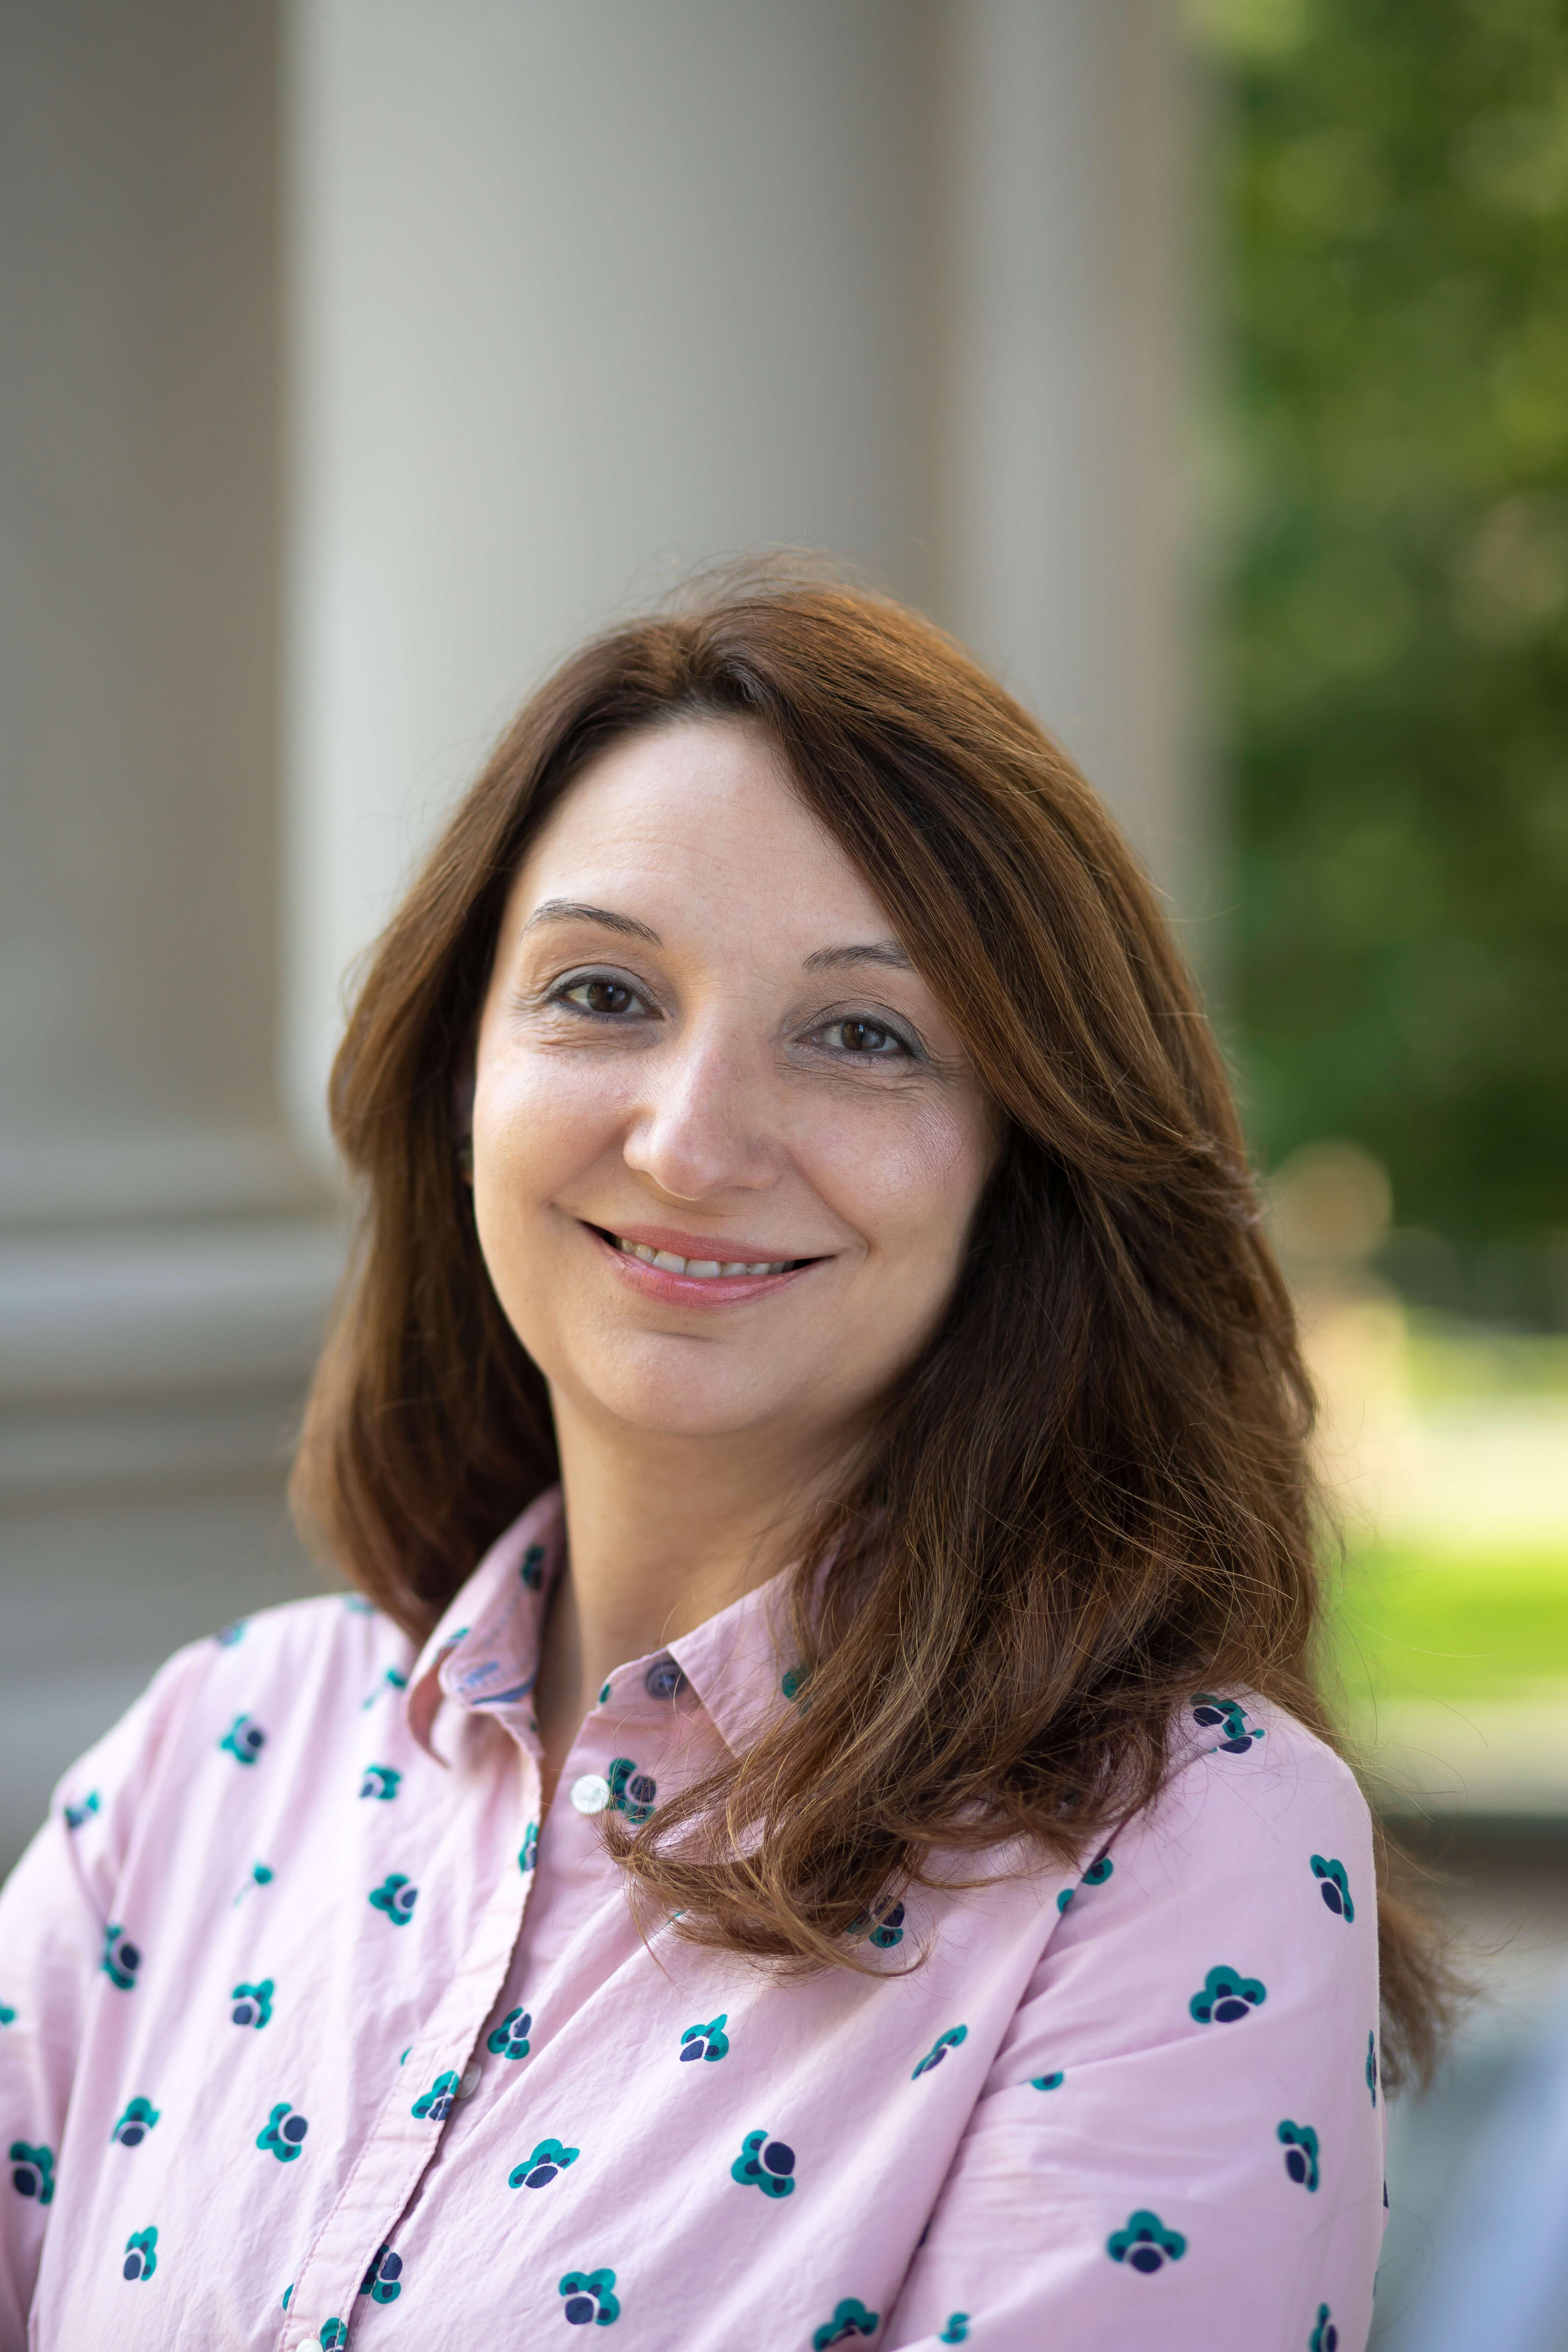 Headshot of Dr. Marina Vujnovic